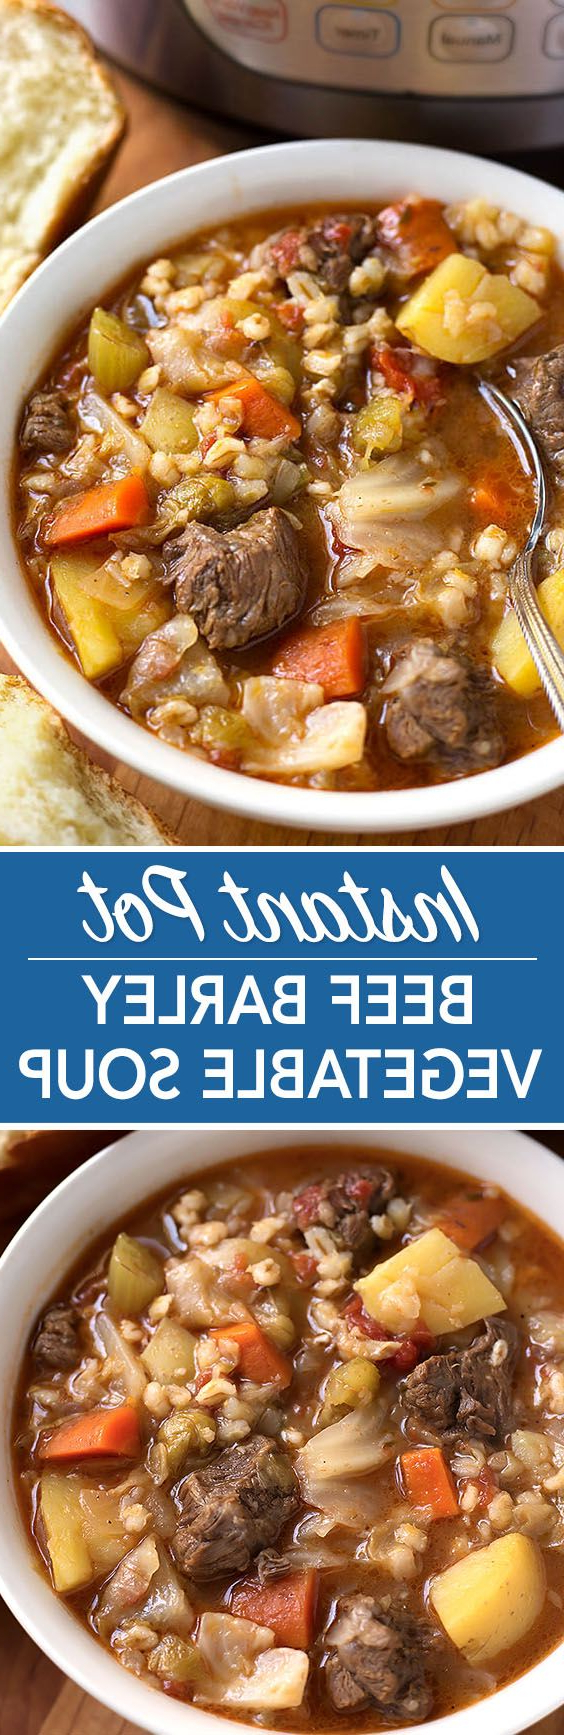 Instant Pot Beef Barley Vegetable Soup Is Nanas Recipe